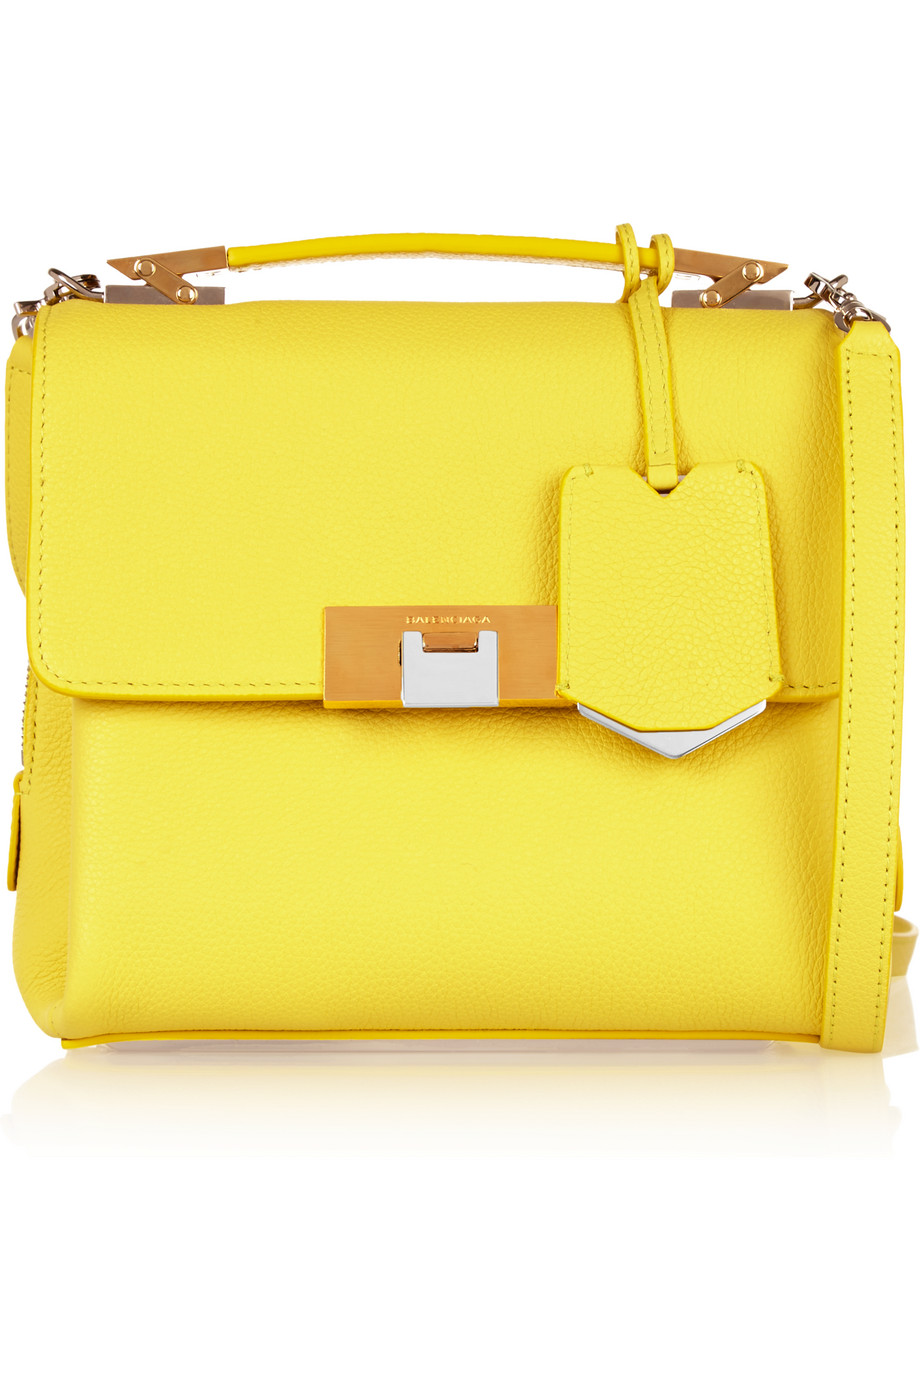 Balenciaga Le Dix Mini Textured-Leather Shoulder Bag, Chartreuse, Women's